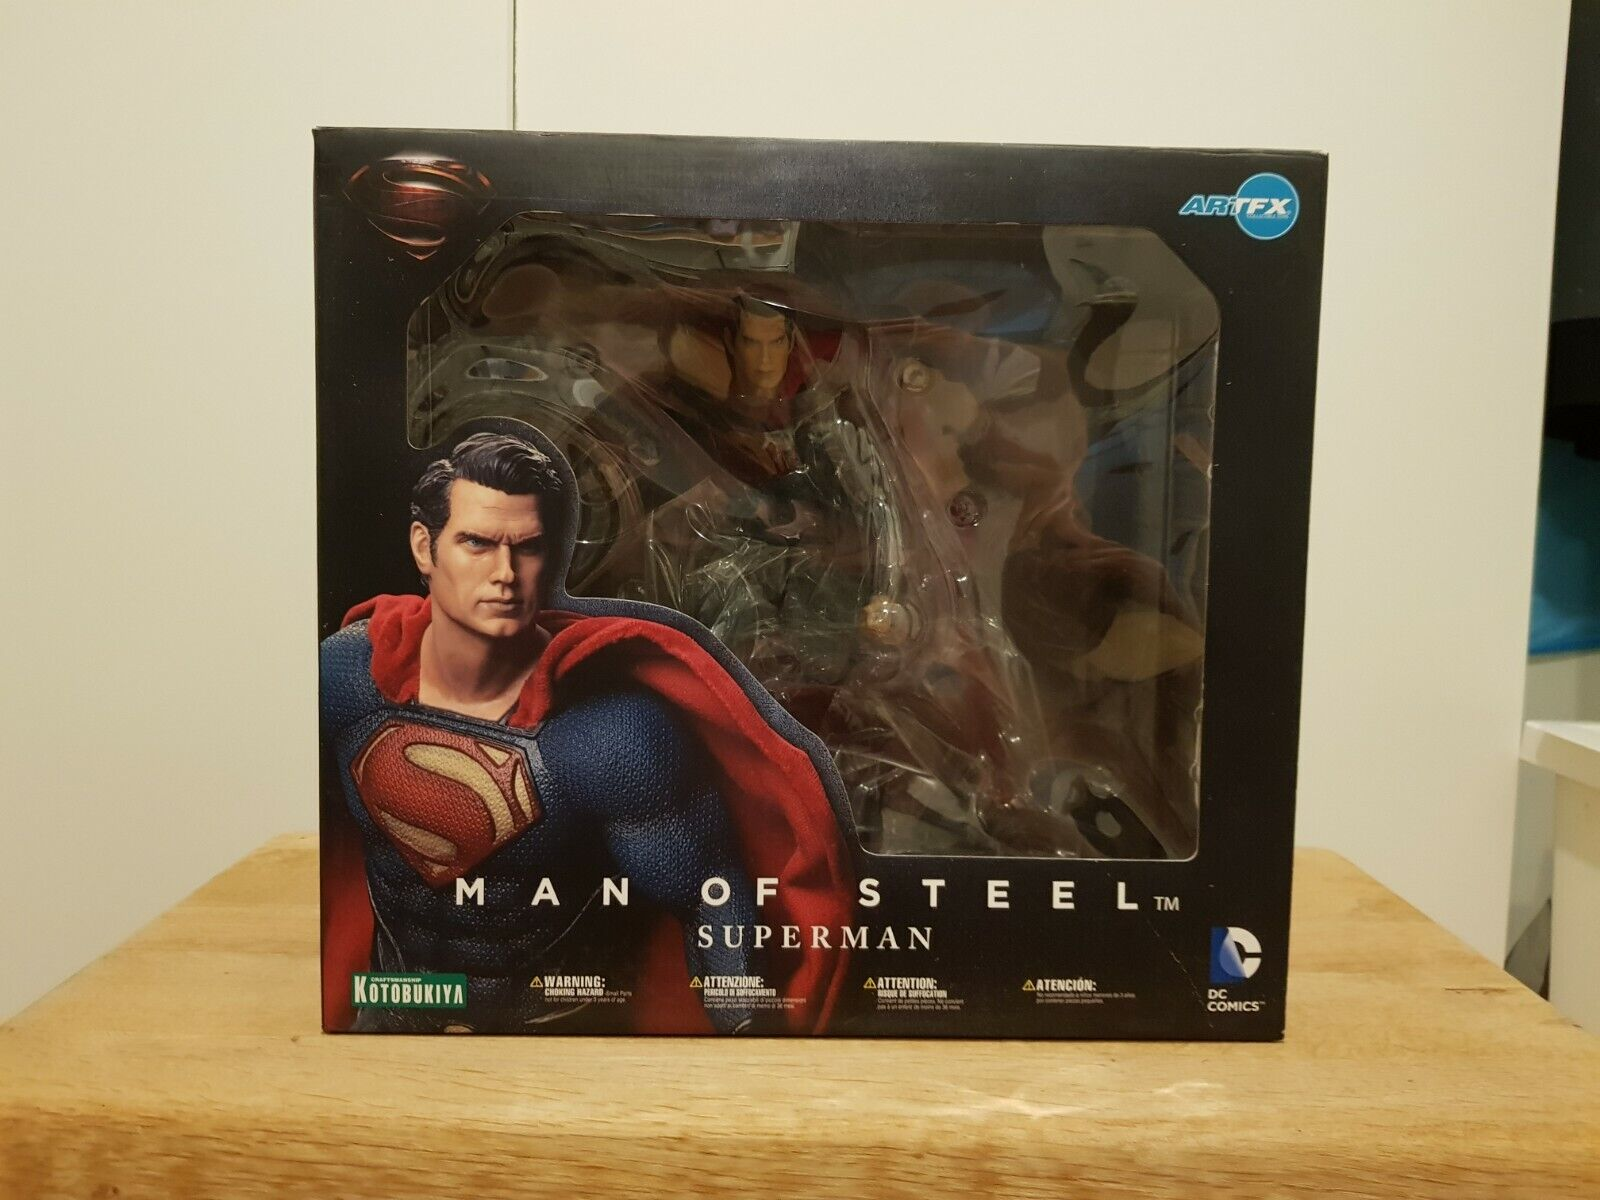 Kotobukiya uomo of Steel Superuomo 1 6 PVC cifra  ArtFX  Garanzia del prezzo al 100%